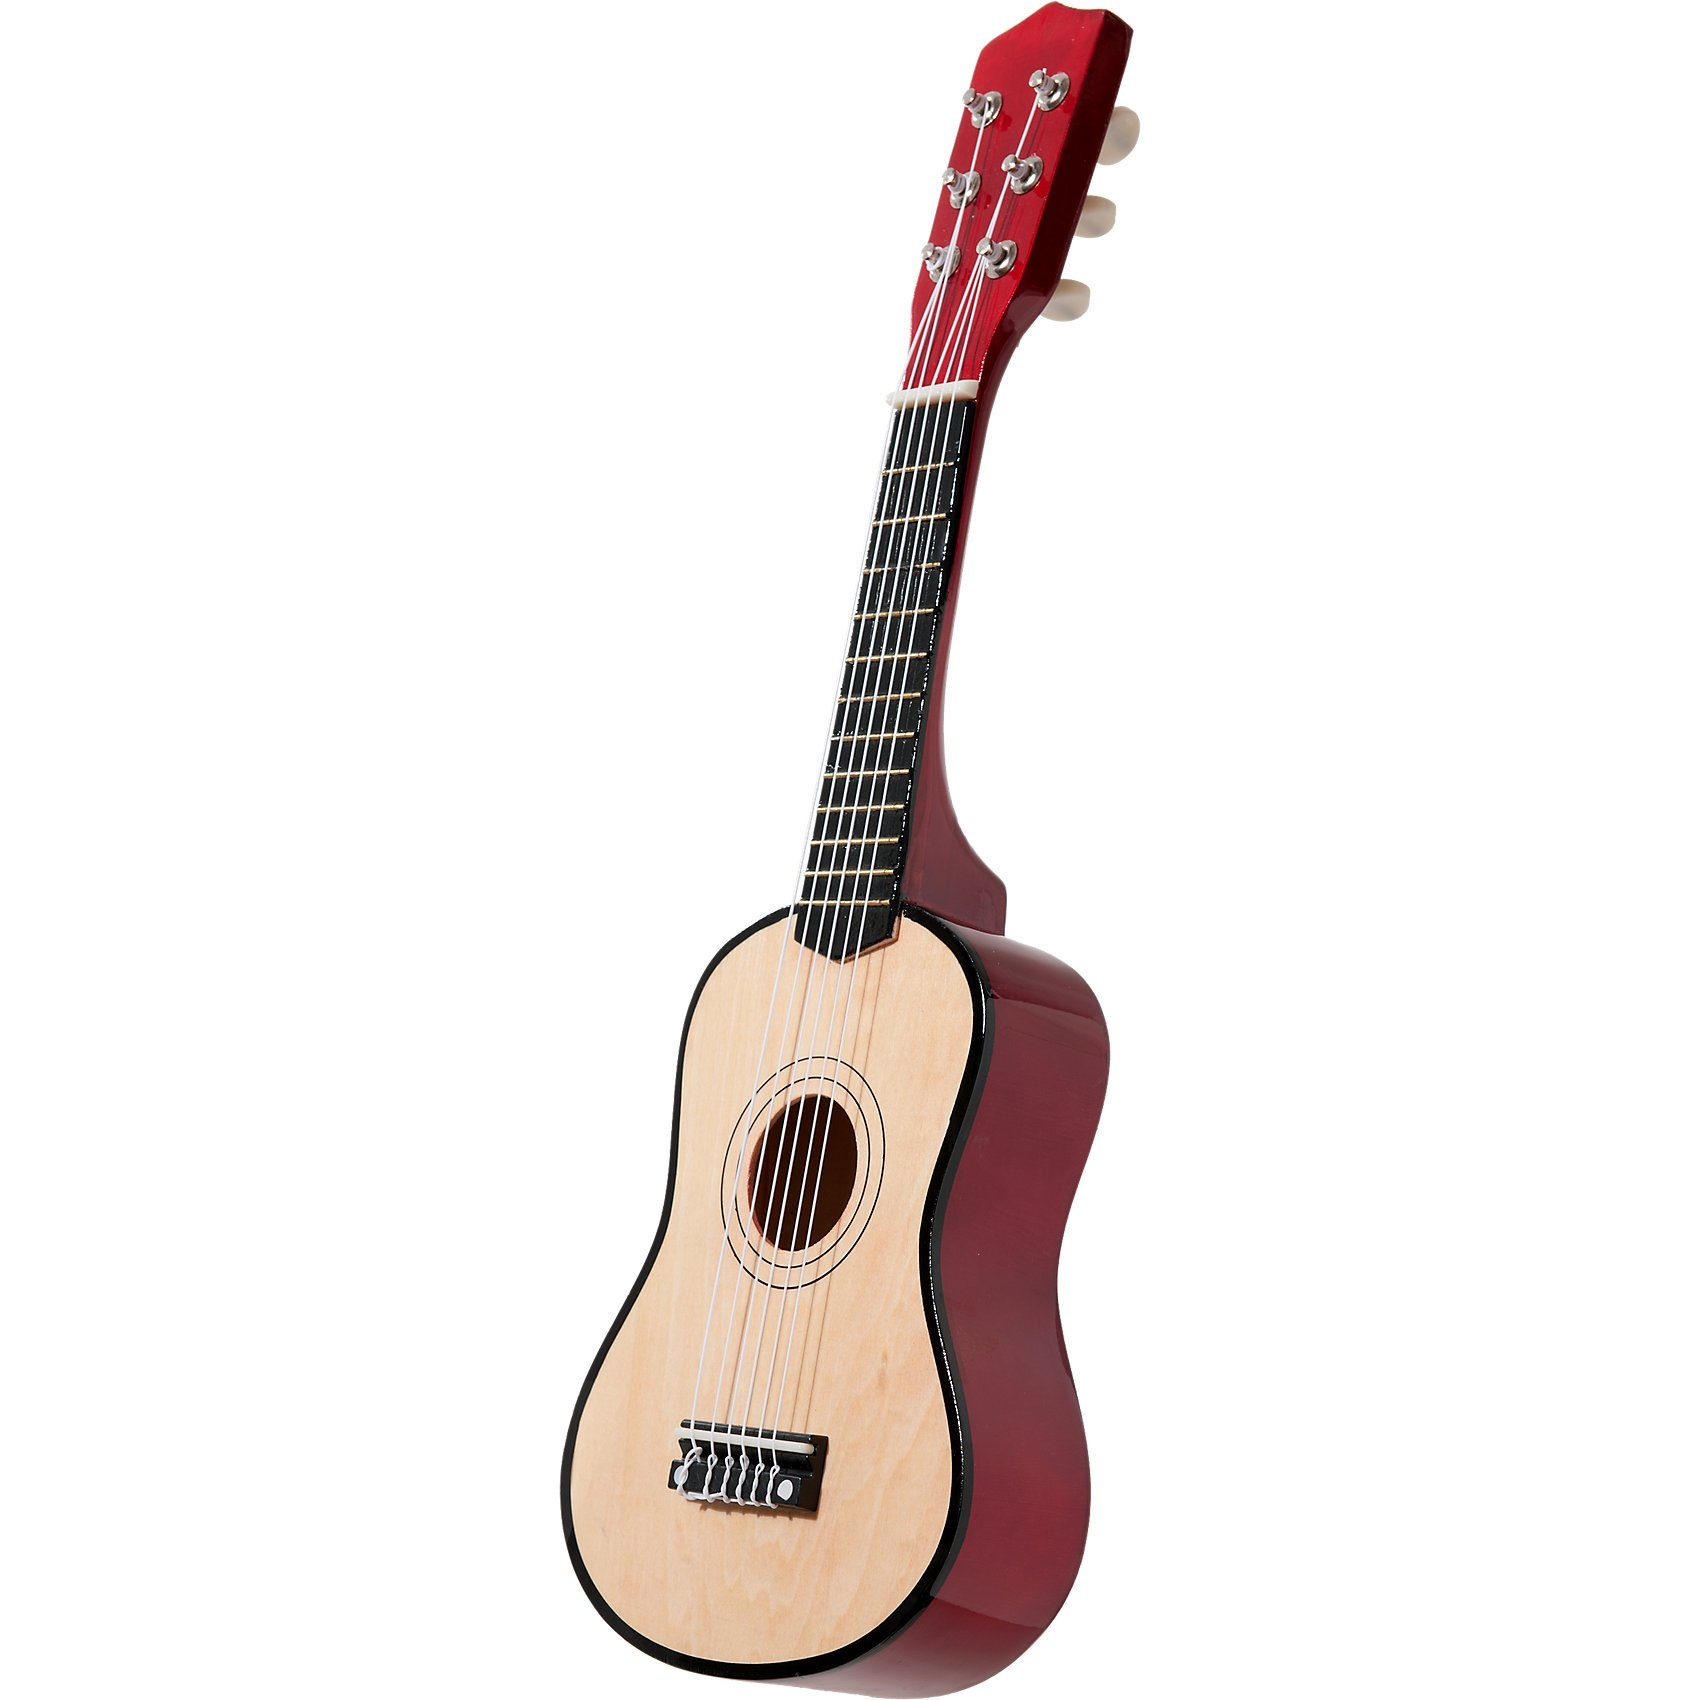 Bontempi Klassische Holzgitarre 55 cm